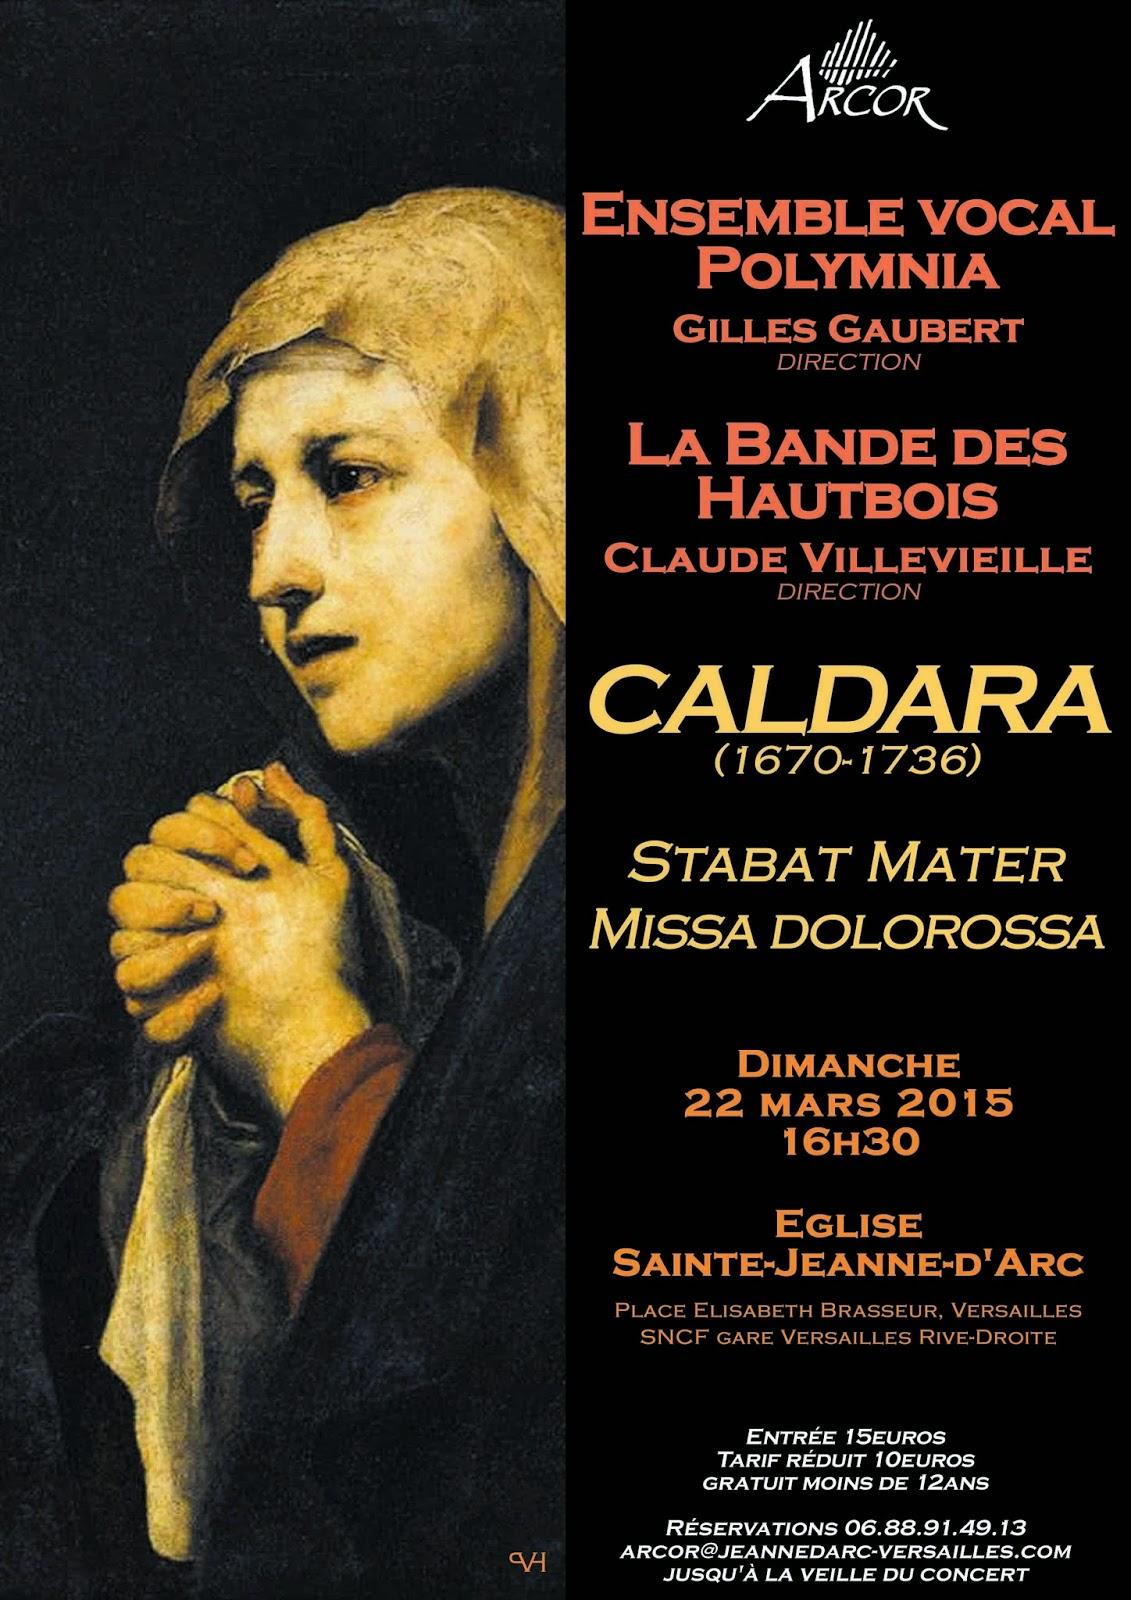 Affiche concert 22 mars 2015